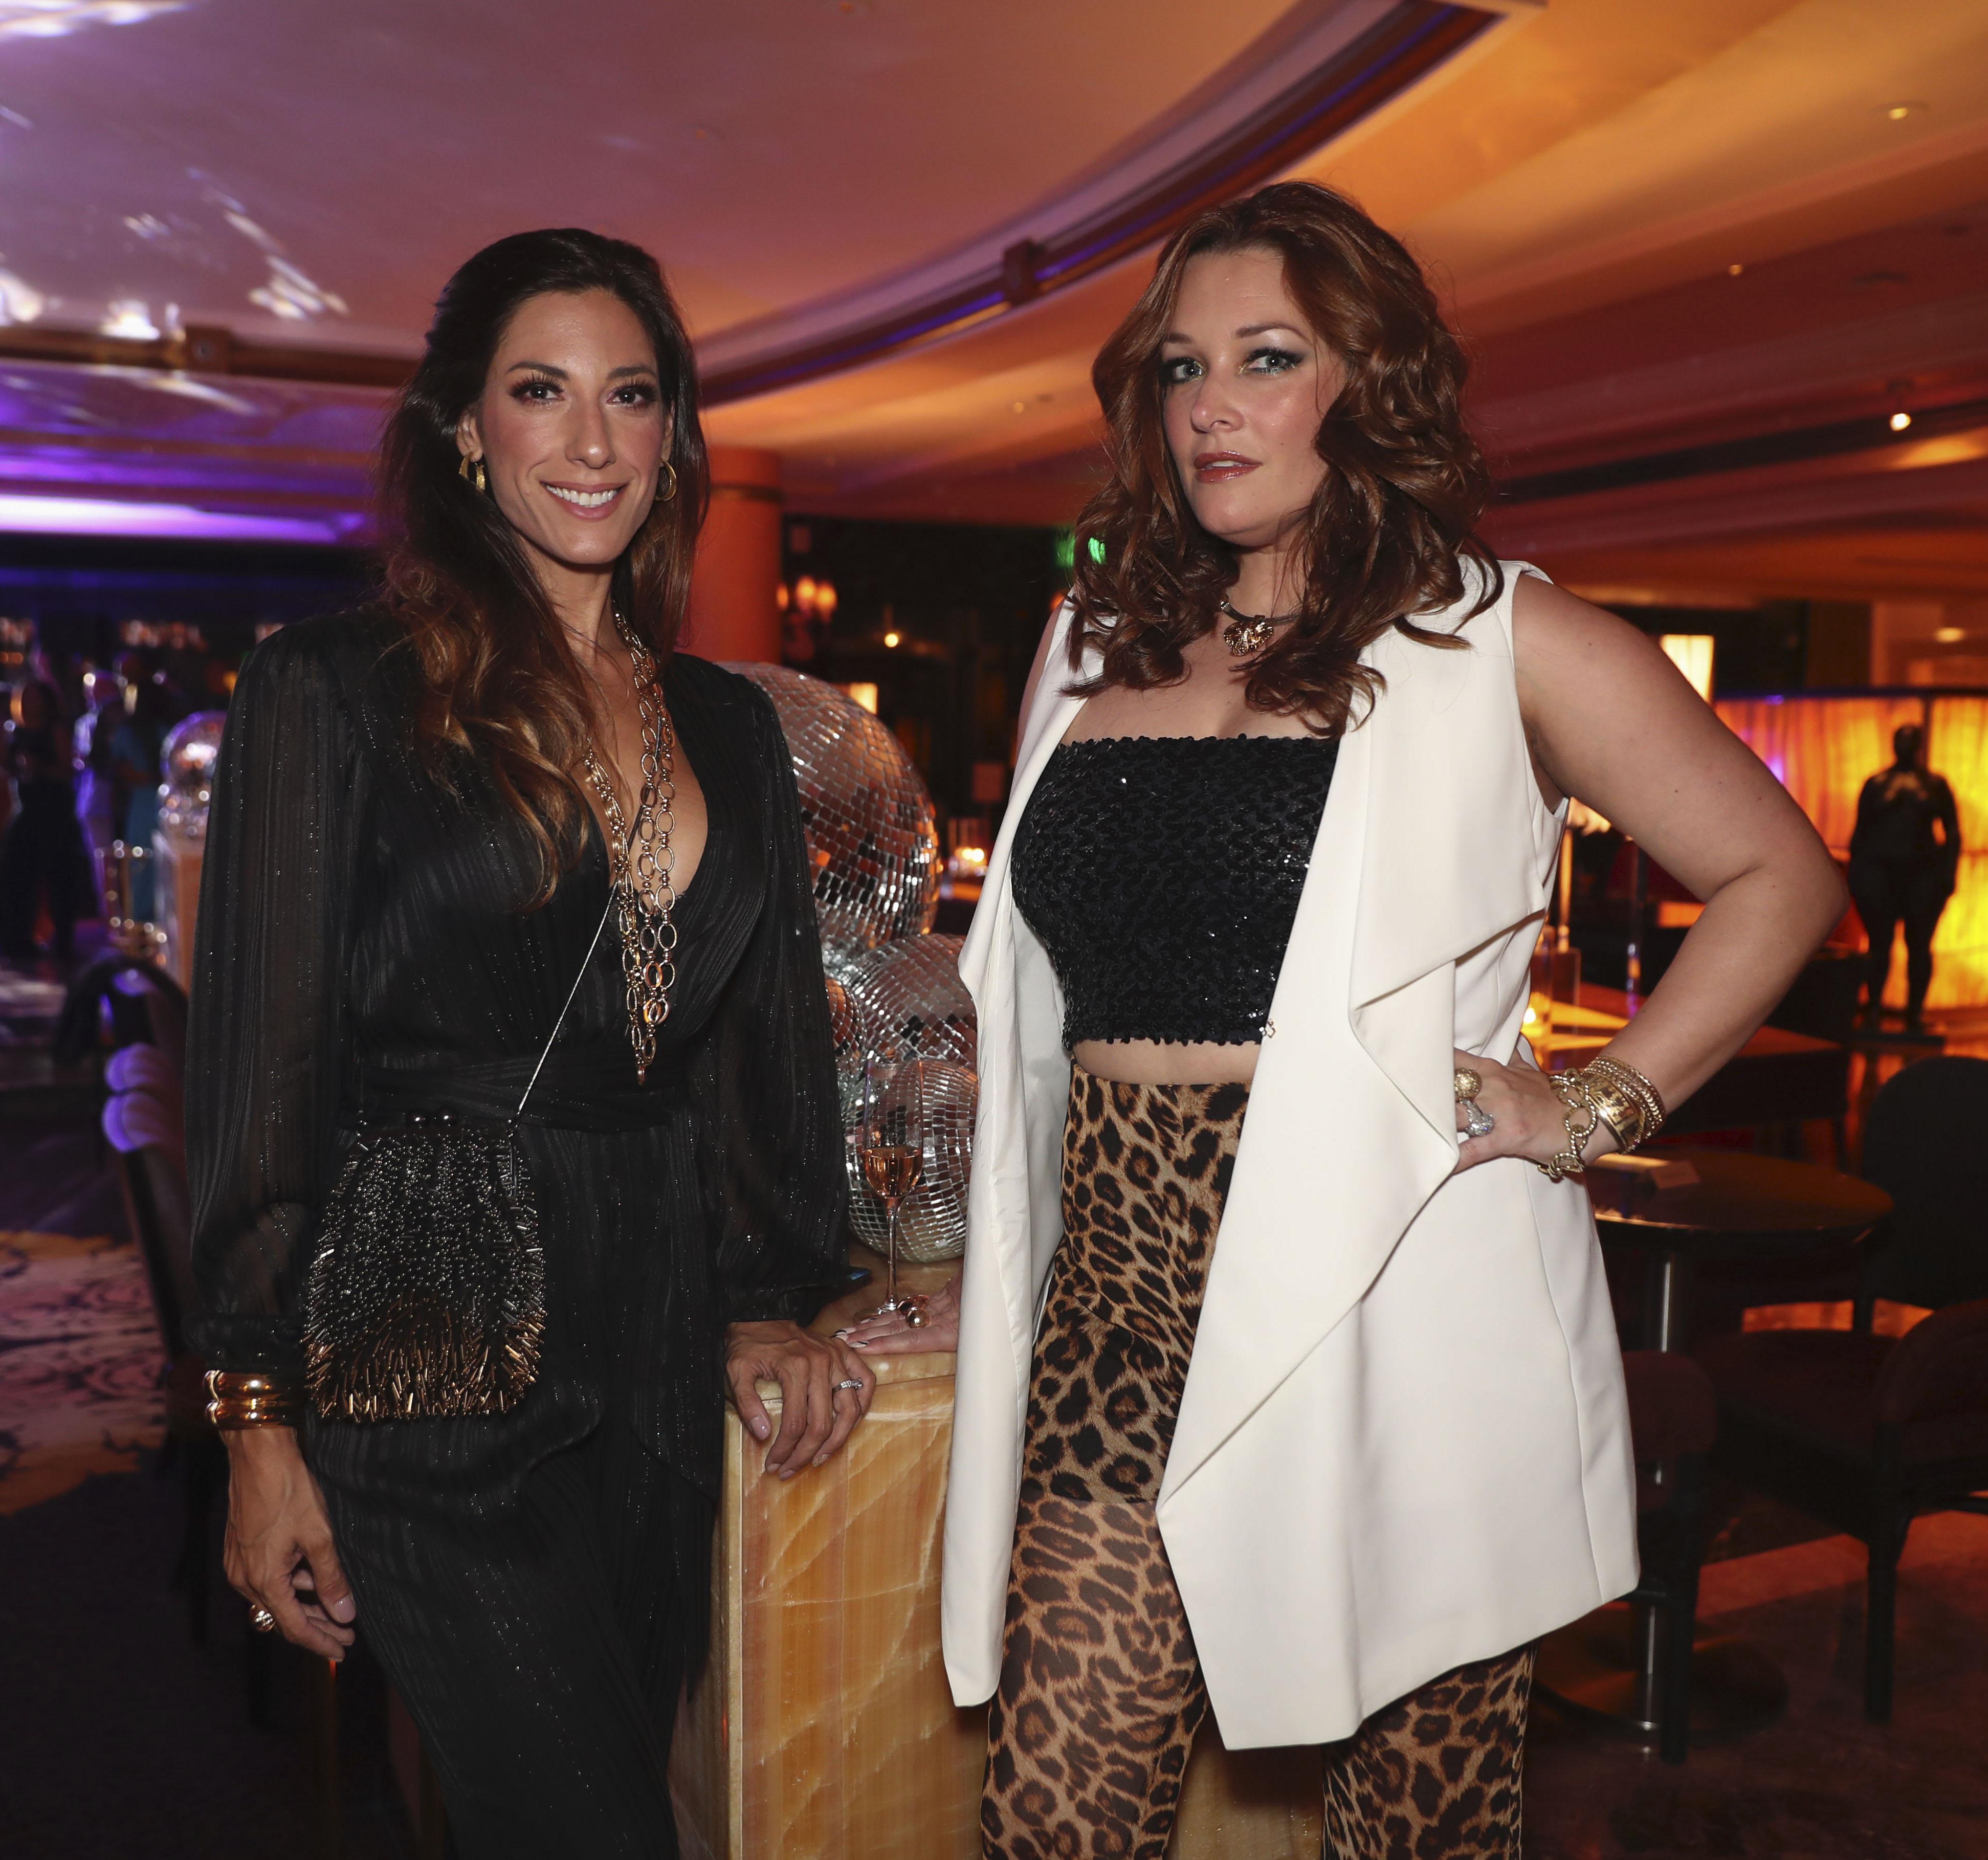 Daniela Dapena y Sofía Jiménez. (Suministrada)